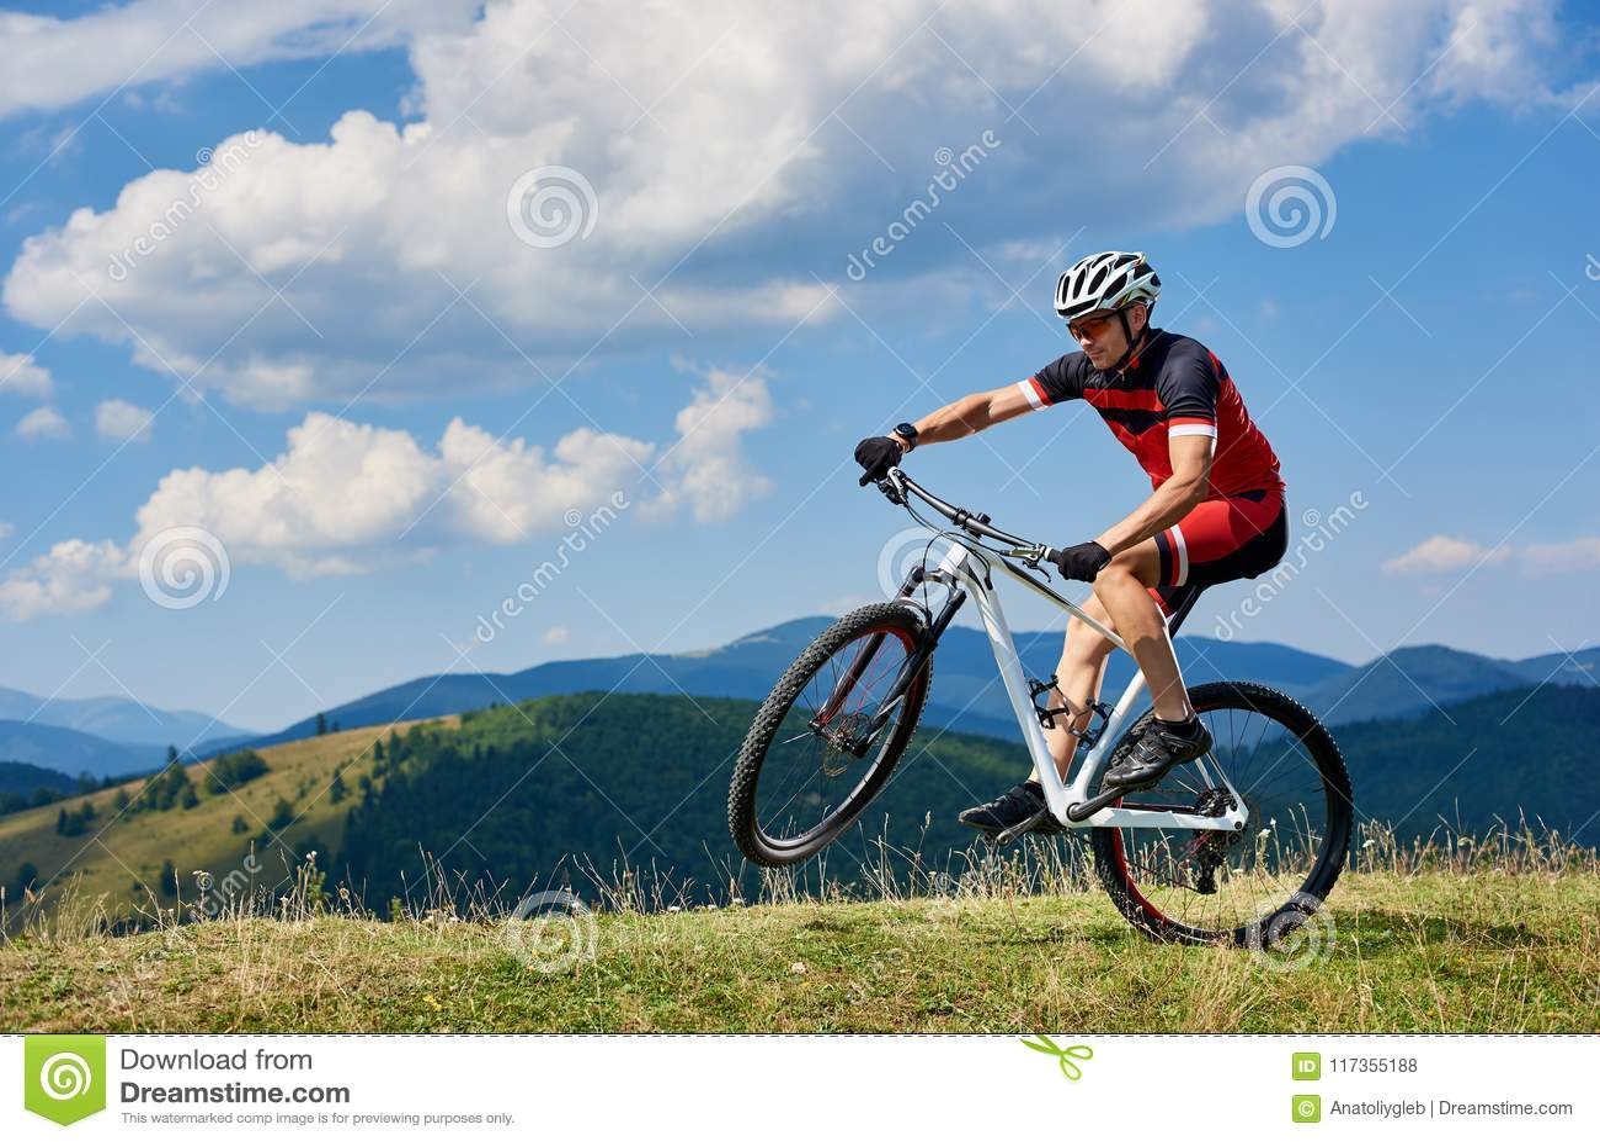 Young athletic sportsman tourist biker in professional sportswear turning on one wheel of bike